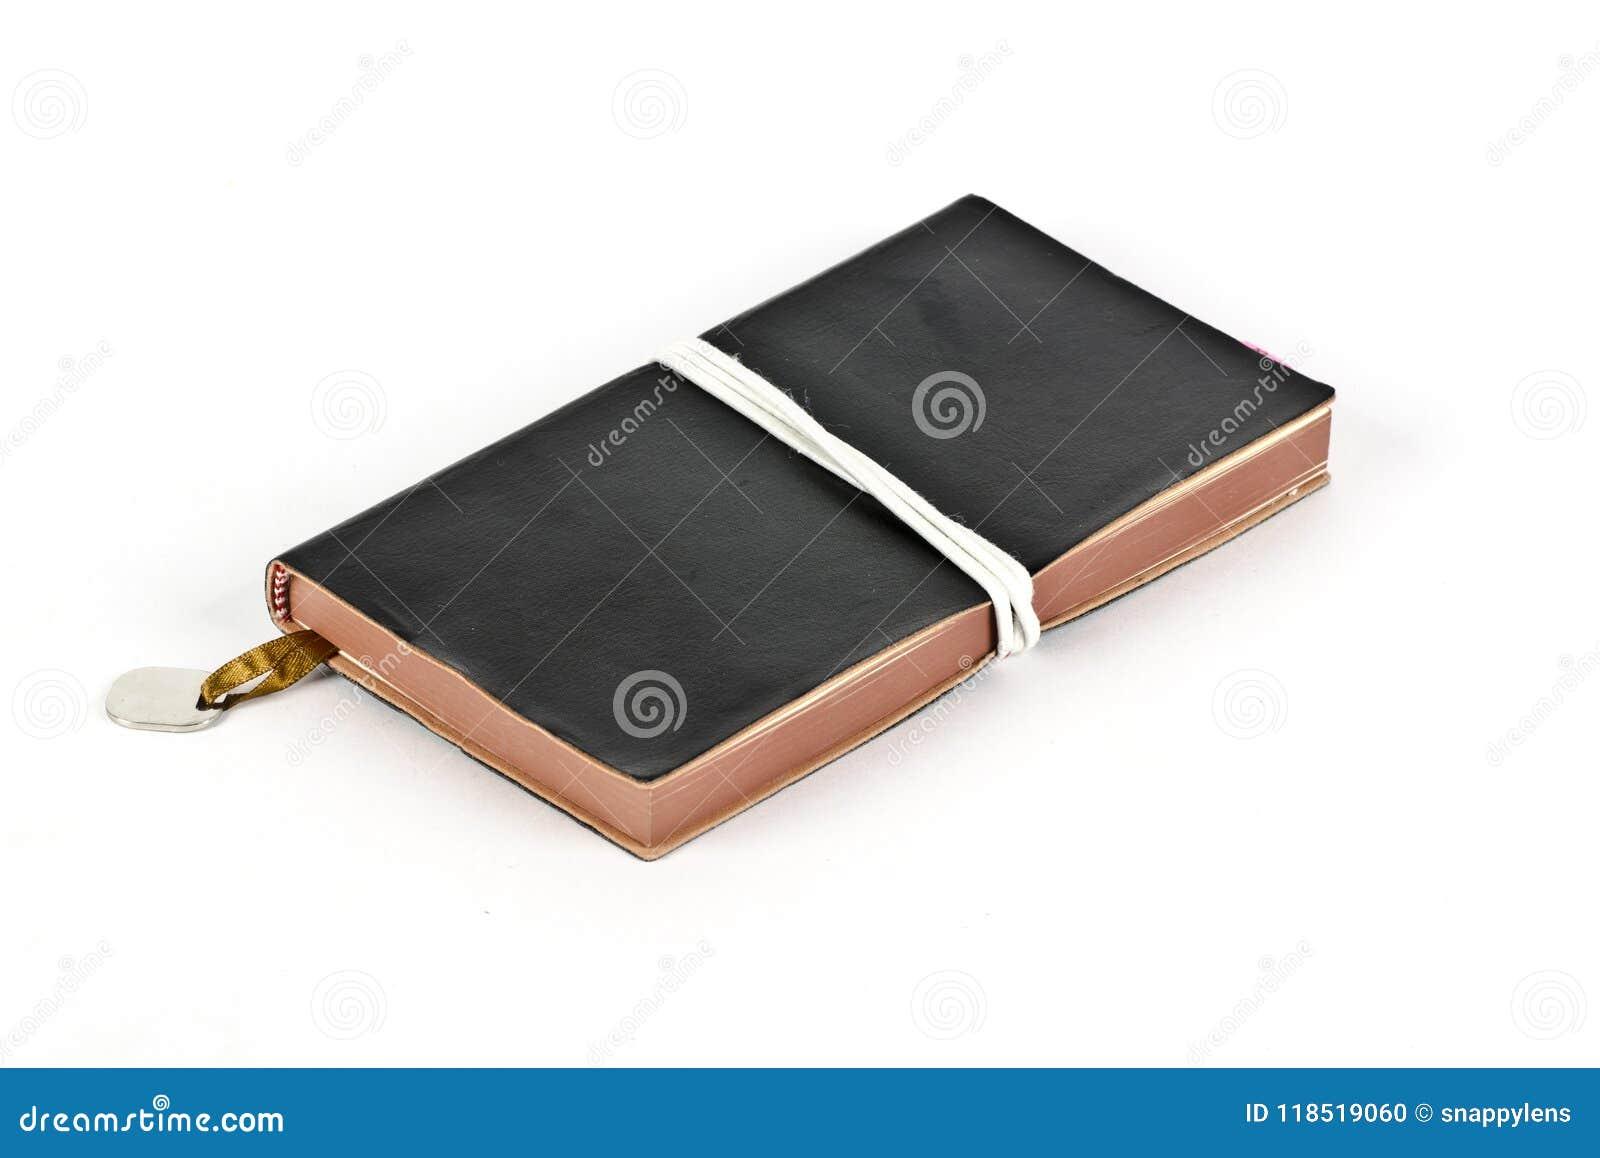 Un diario personal con un marcador